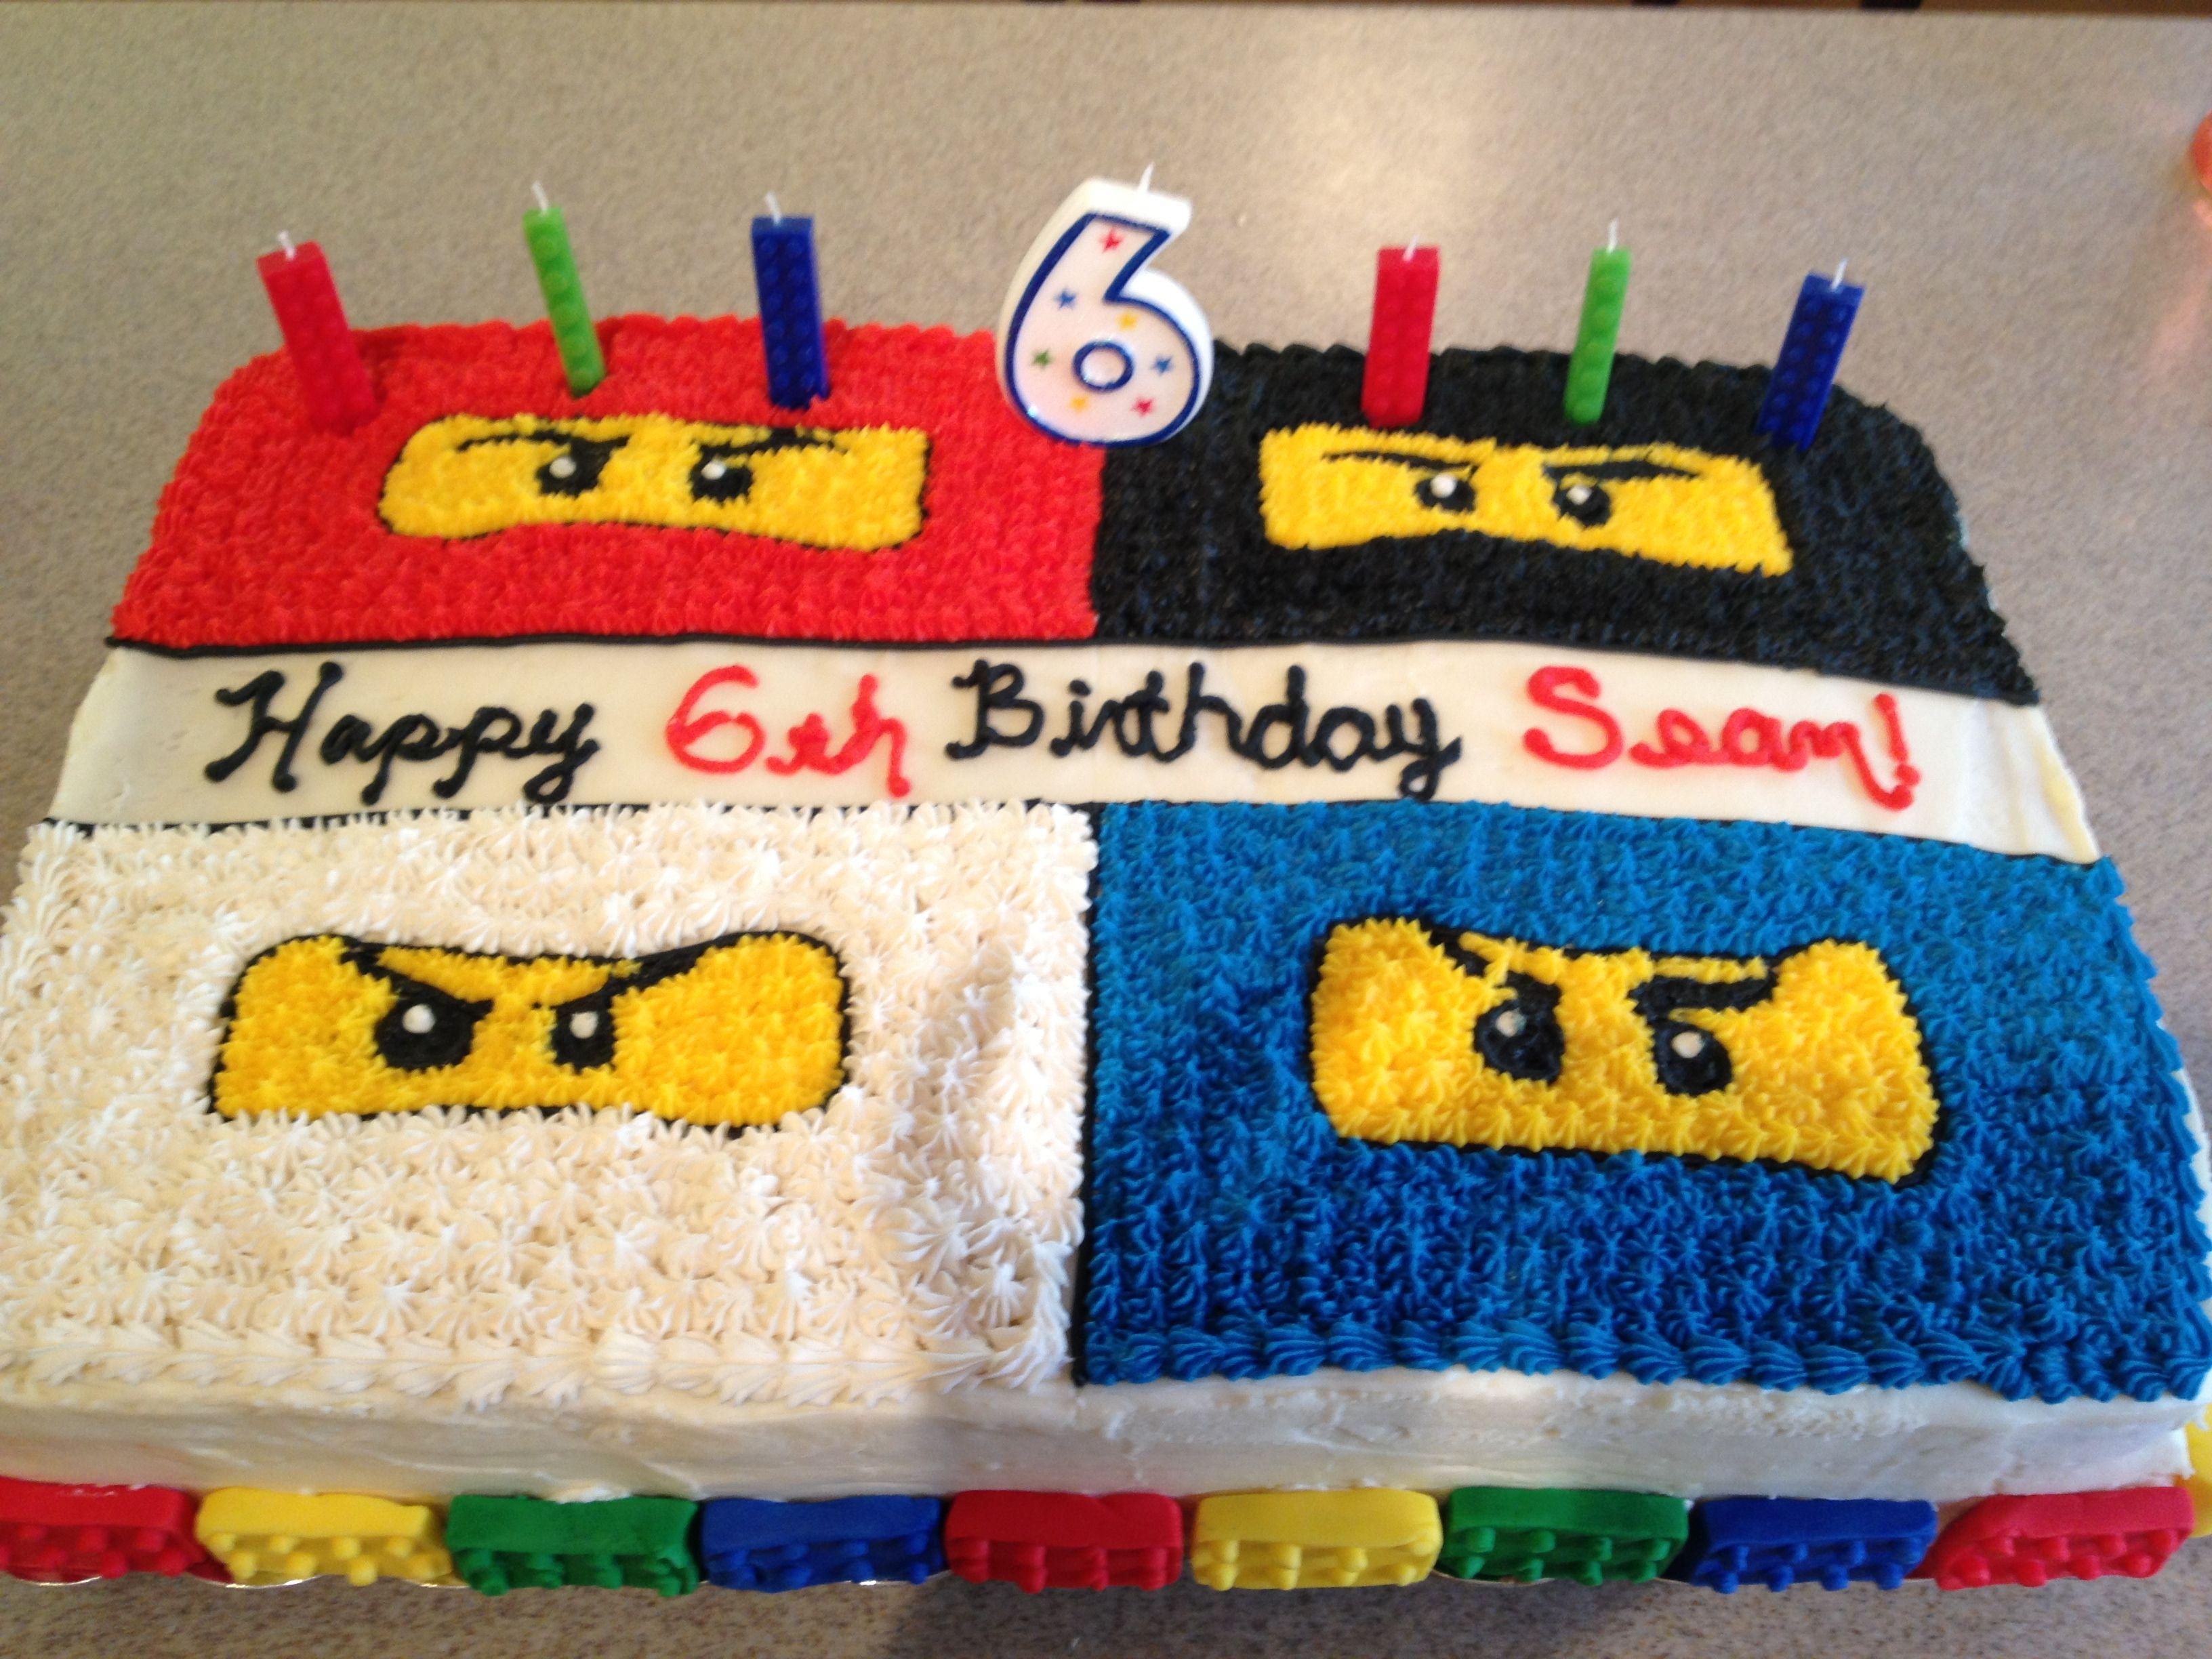 The Cake Design In Buttercream Fondant Legos Around Base